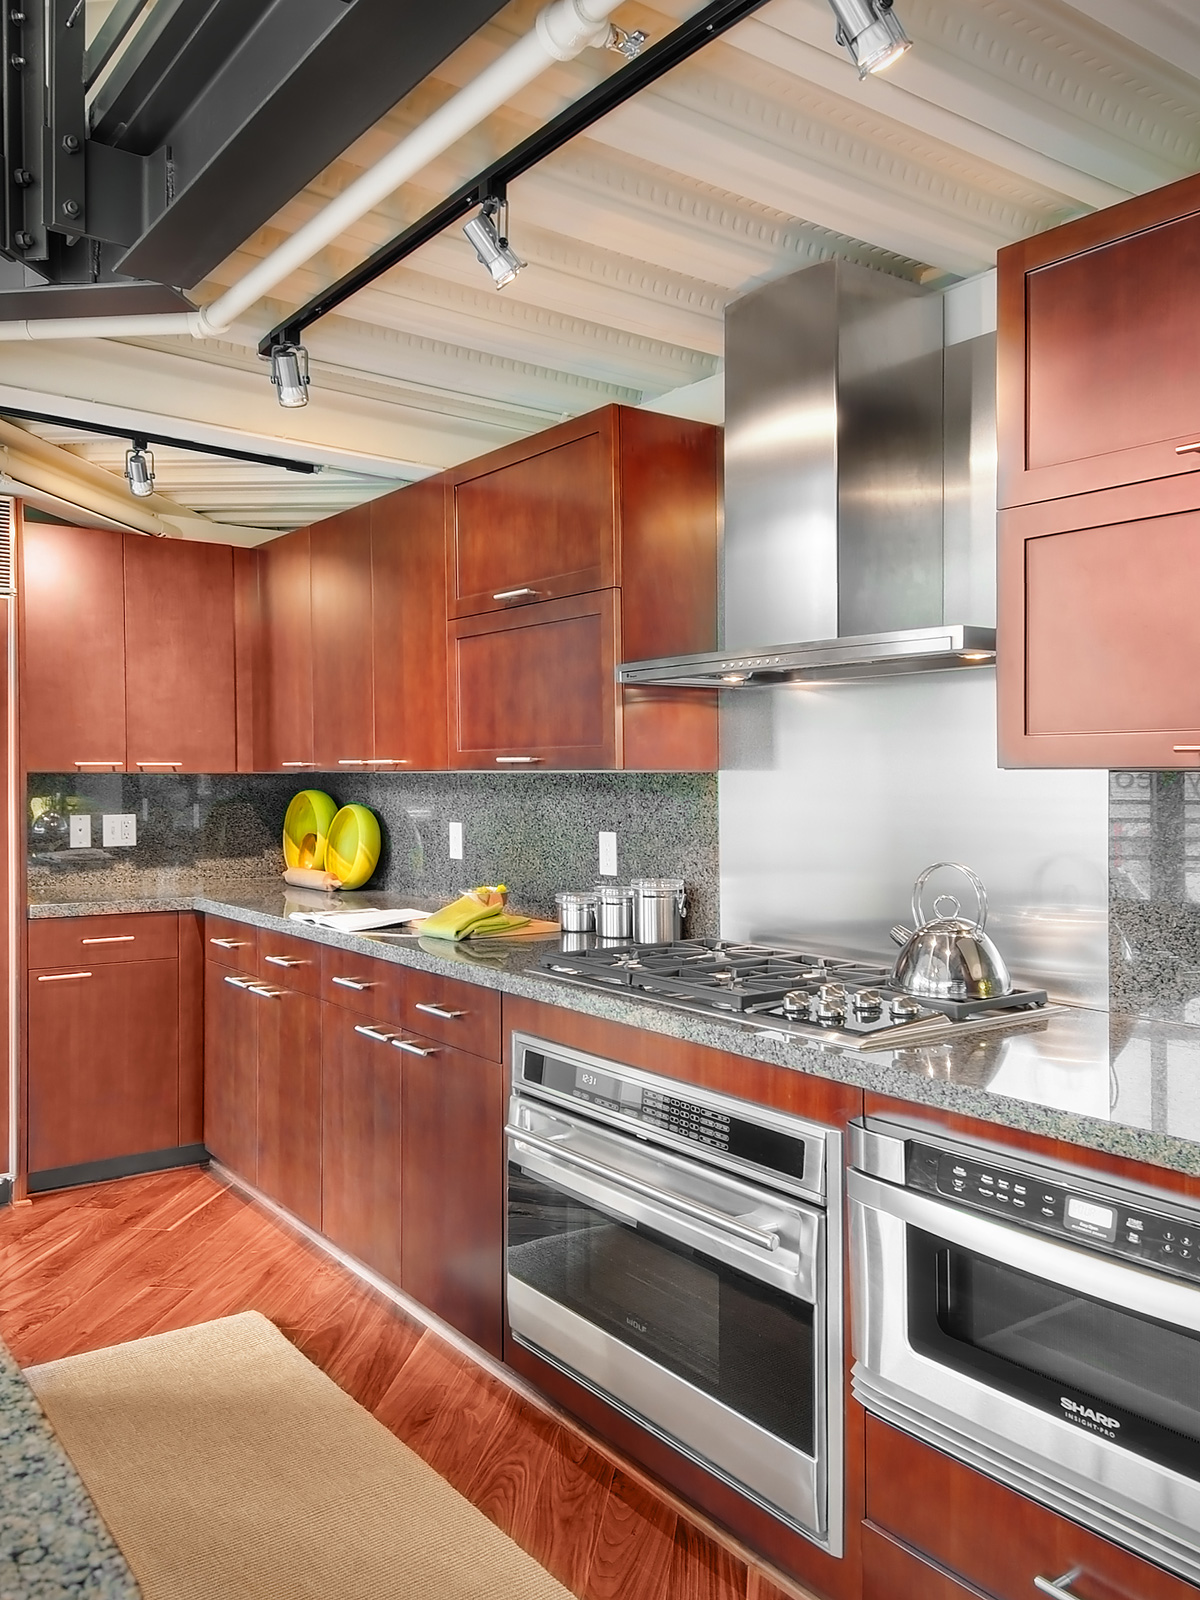 Madison Lofts building kitchen interior